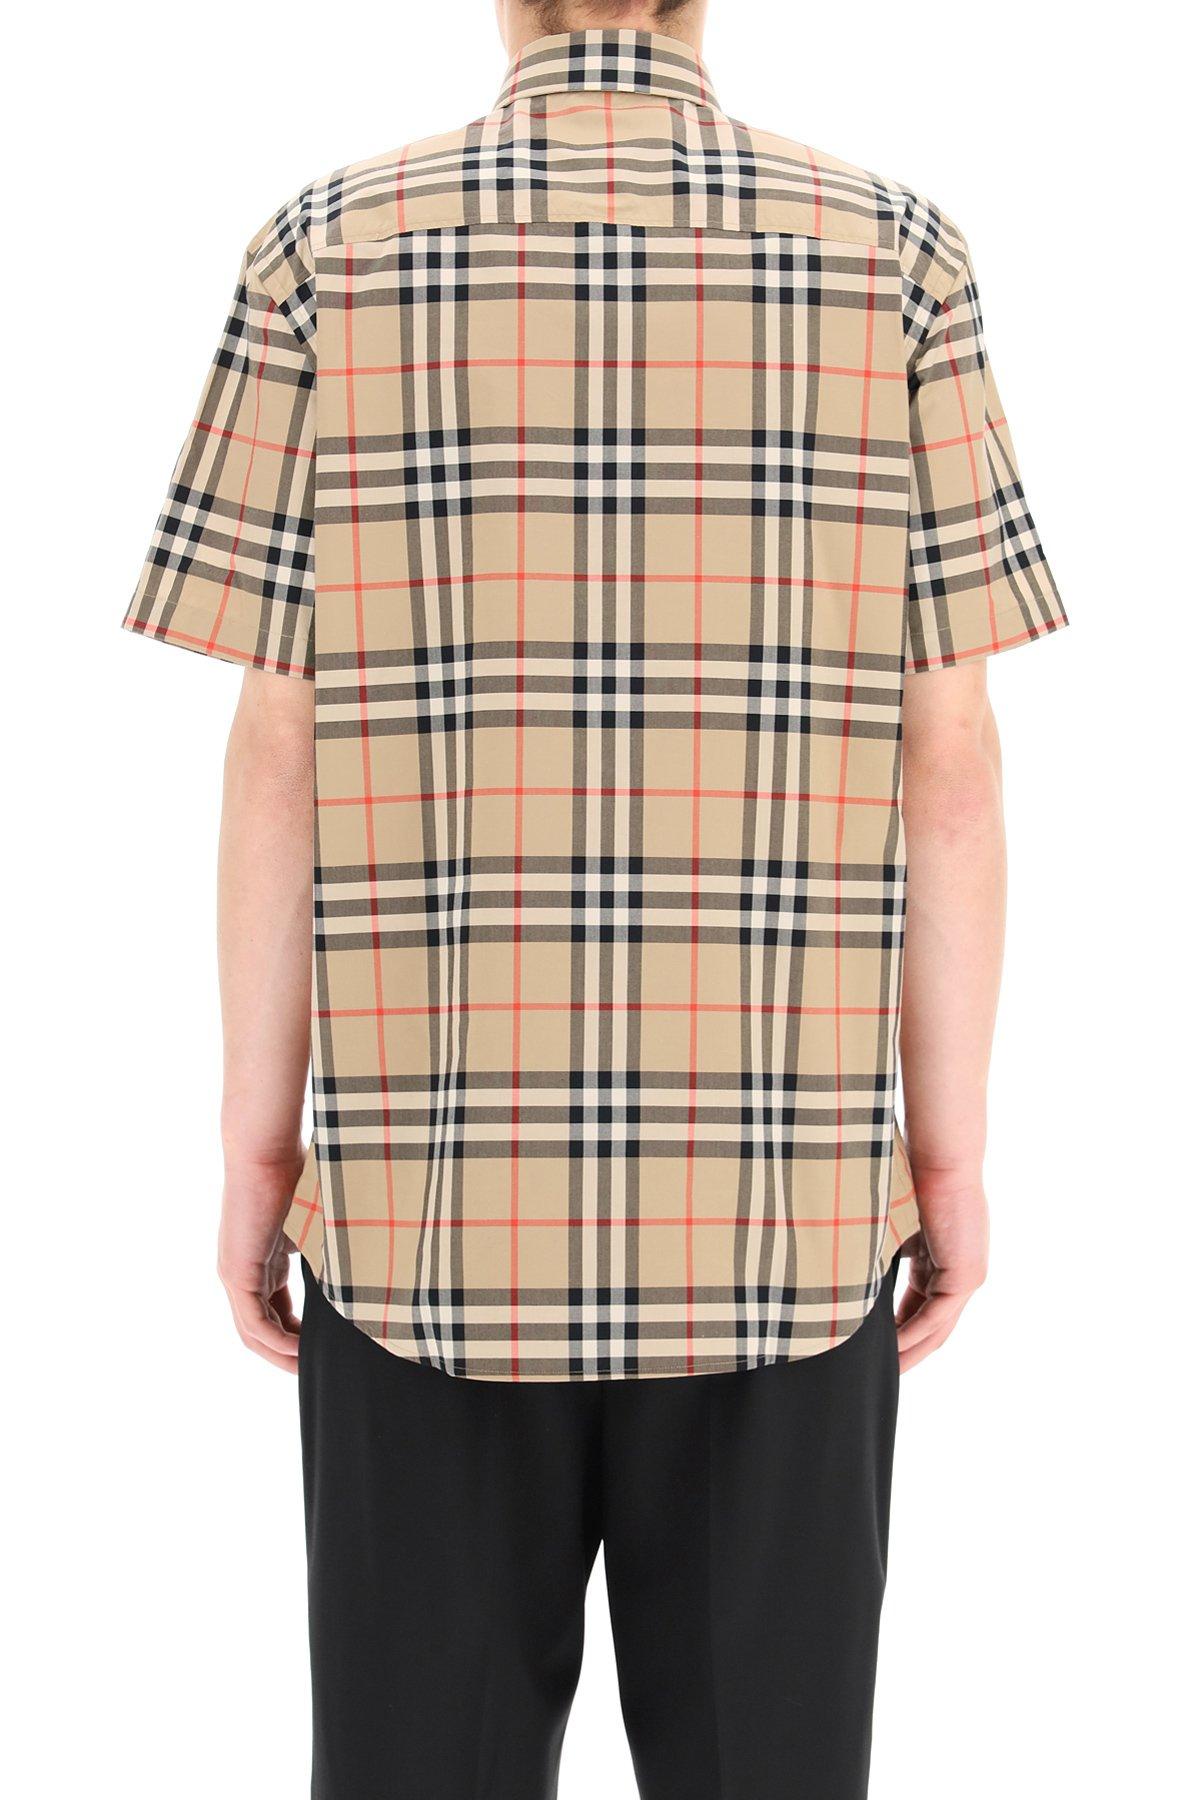 Burberry camicia caxton tartan